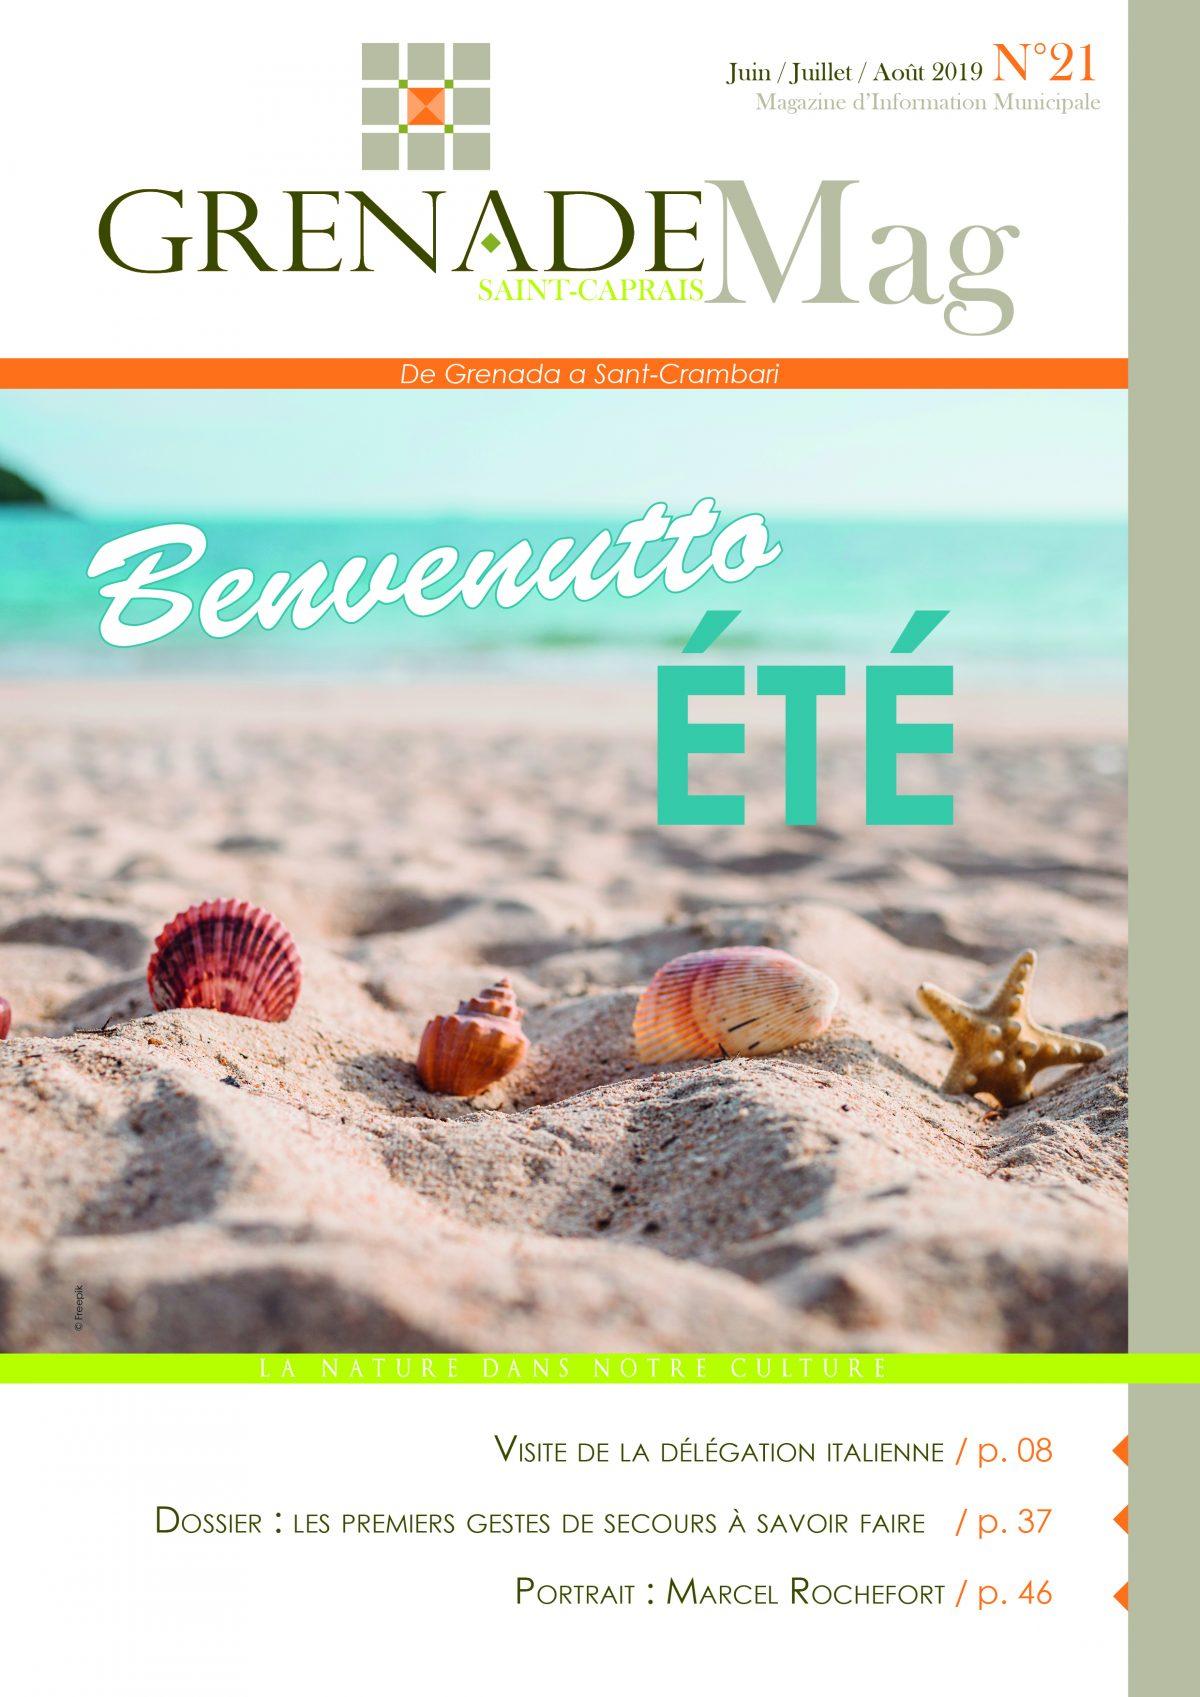 Bulletin municipal Juin / Juillet / Août 2019